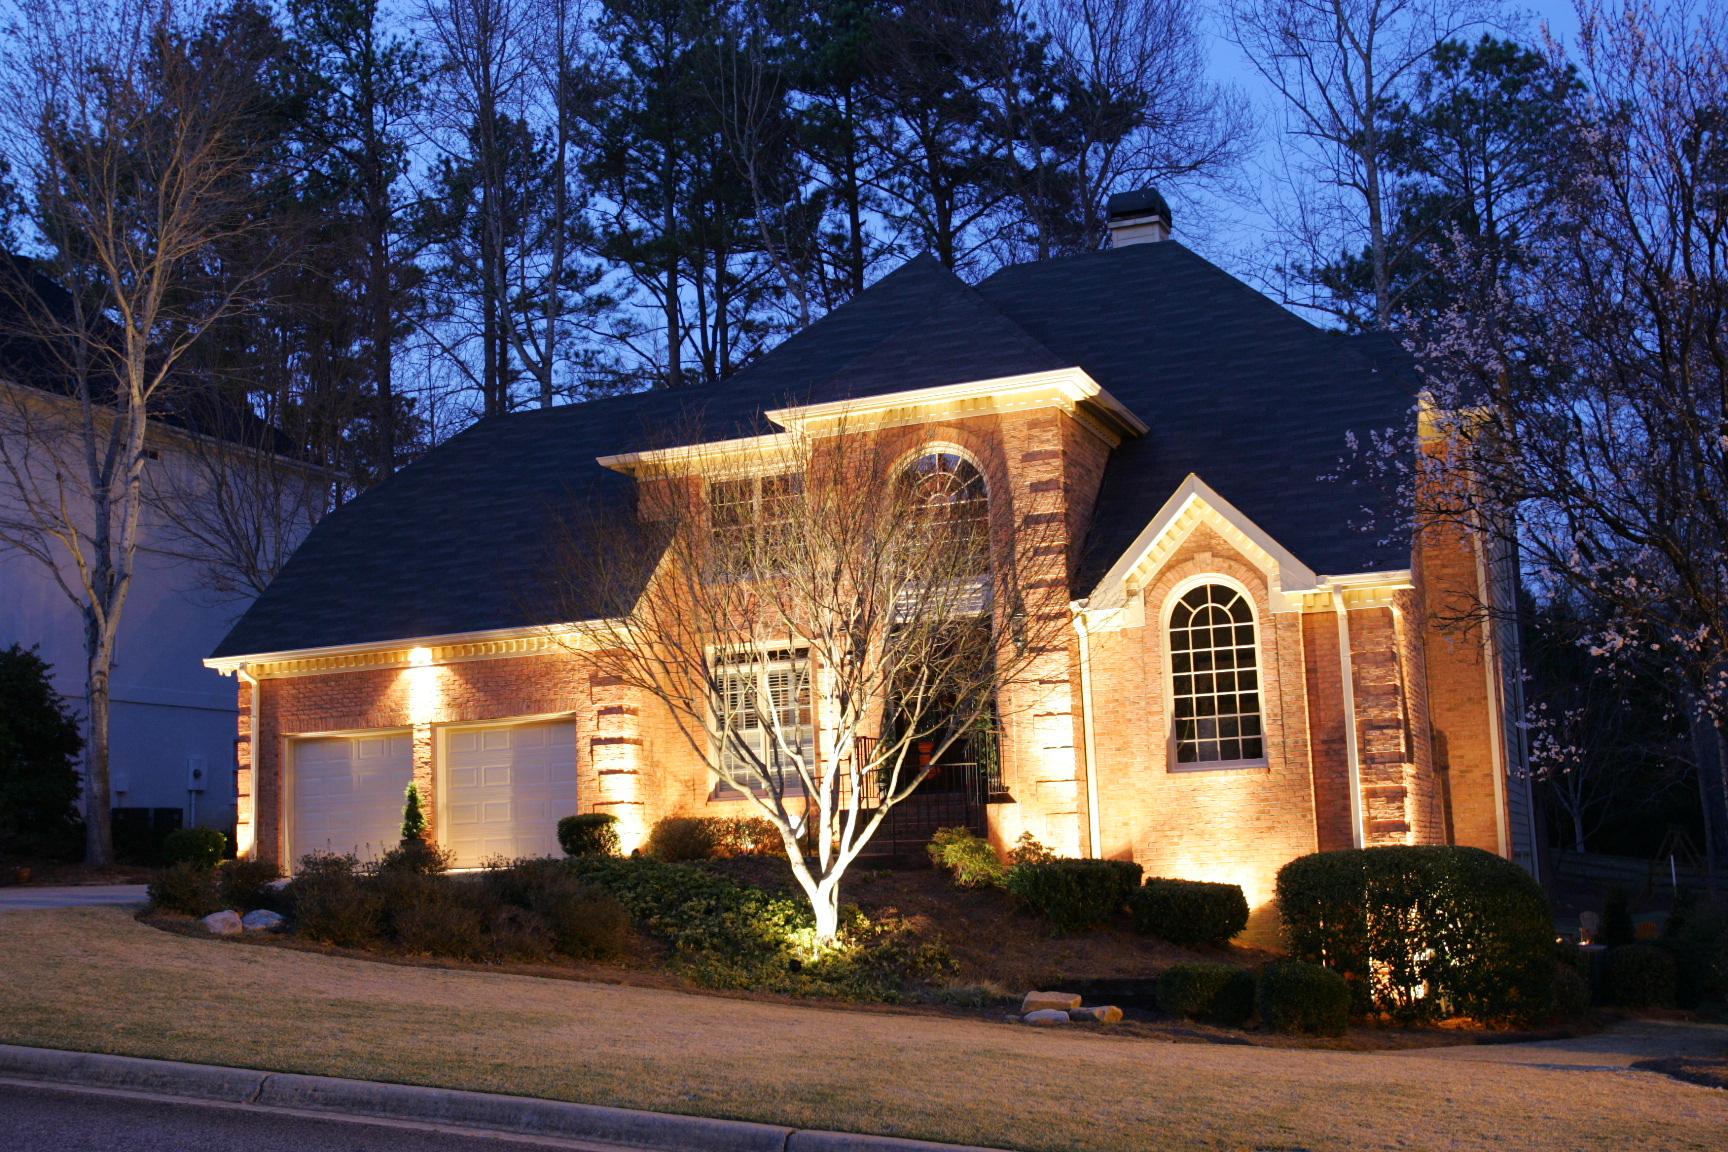 https://secureservercdn.net/198.71.233.39/f0f.f43.myftpupload.com/wp-content/uploads/2017/02/Landscape-Lighting-Birmingham-Alabama-Curb-Appeal-BlueSkyRain.com_.jpg